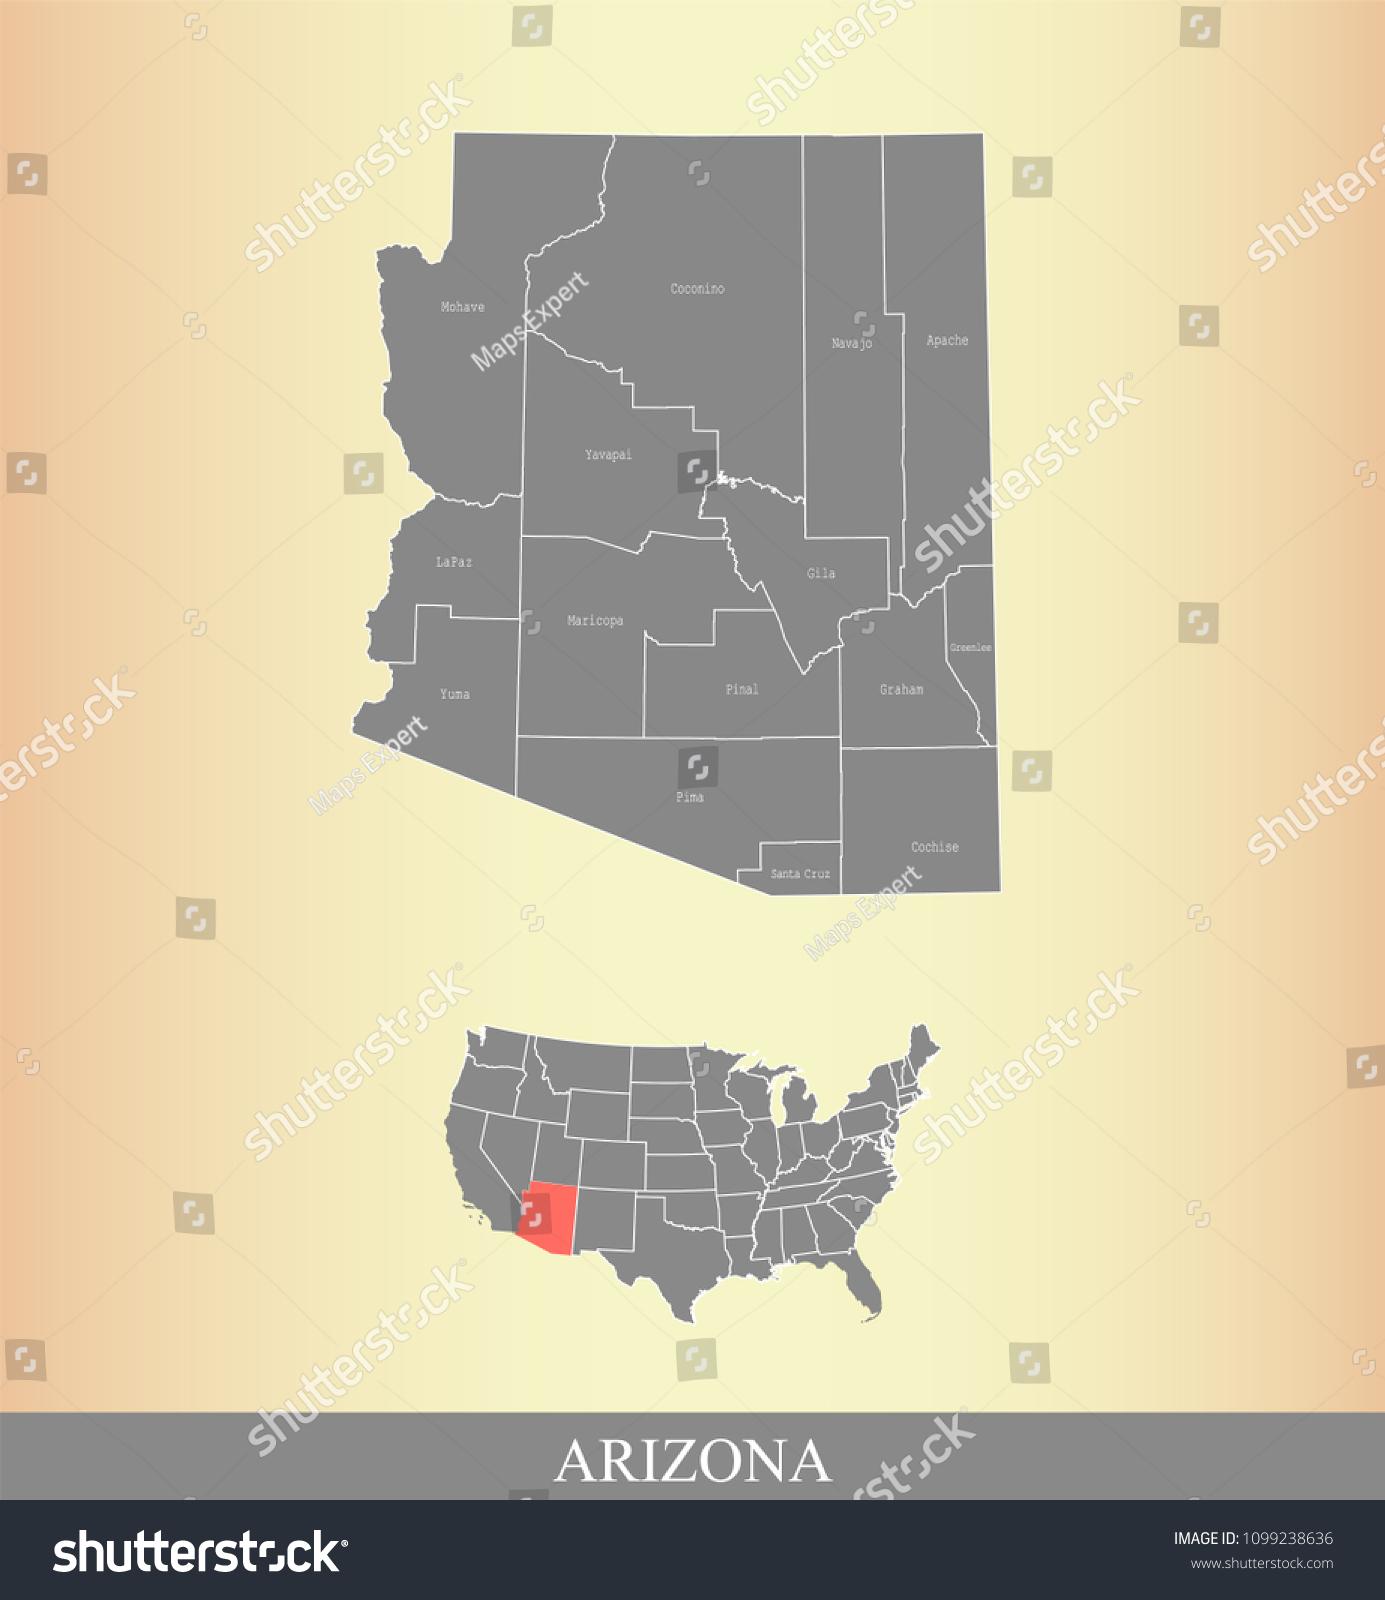 Map Of Arizona By County.Arizona County Map Vector Outline Gray Stock Vector Royalty Free